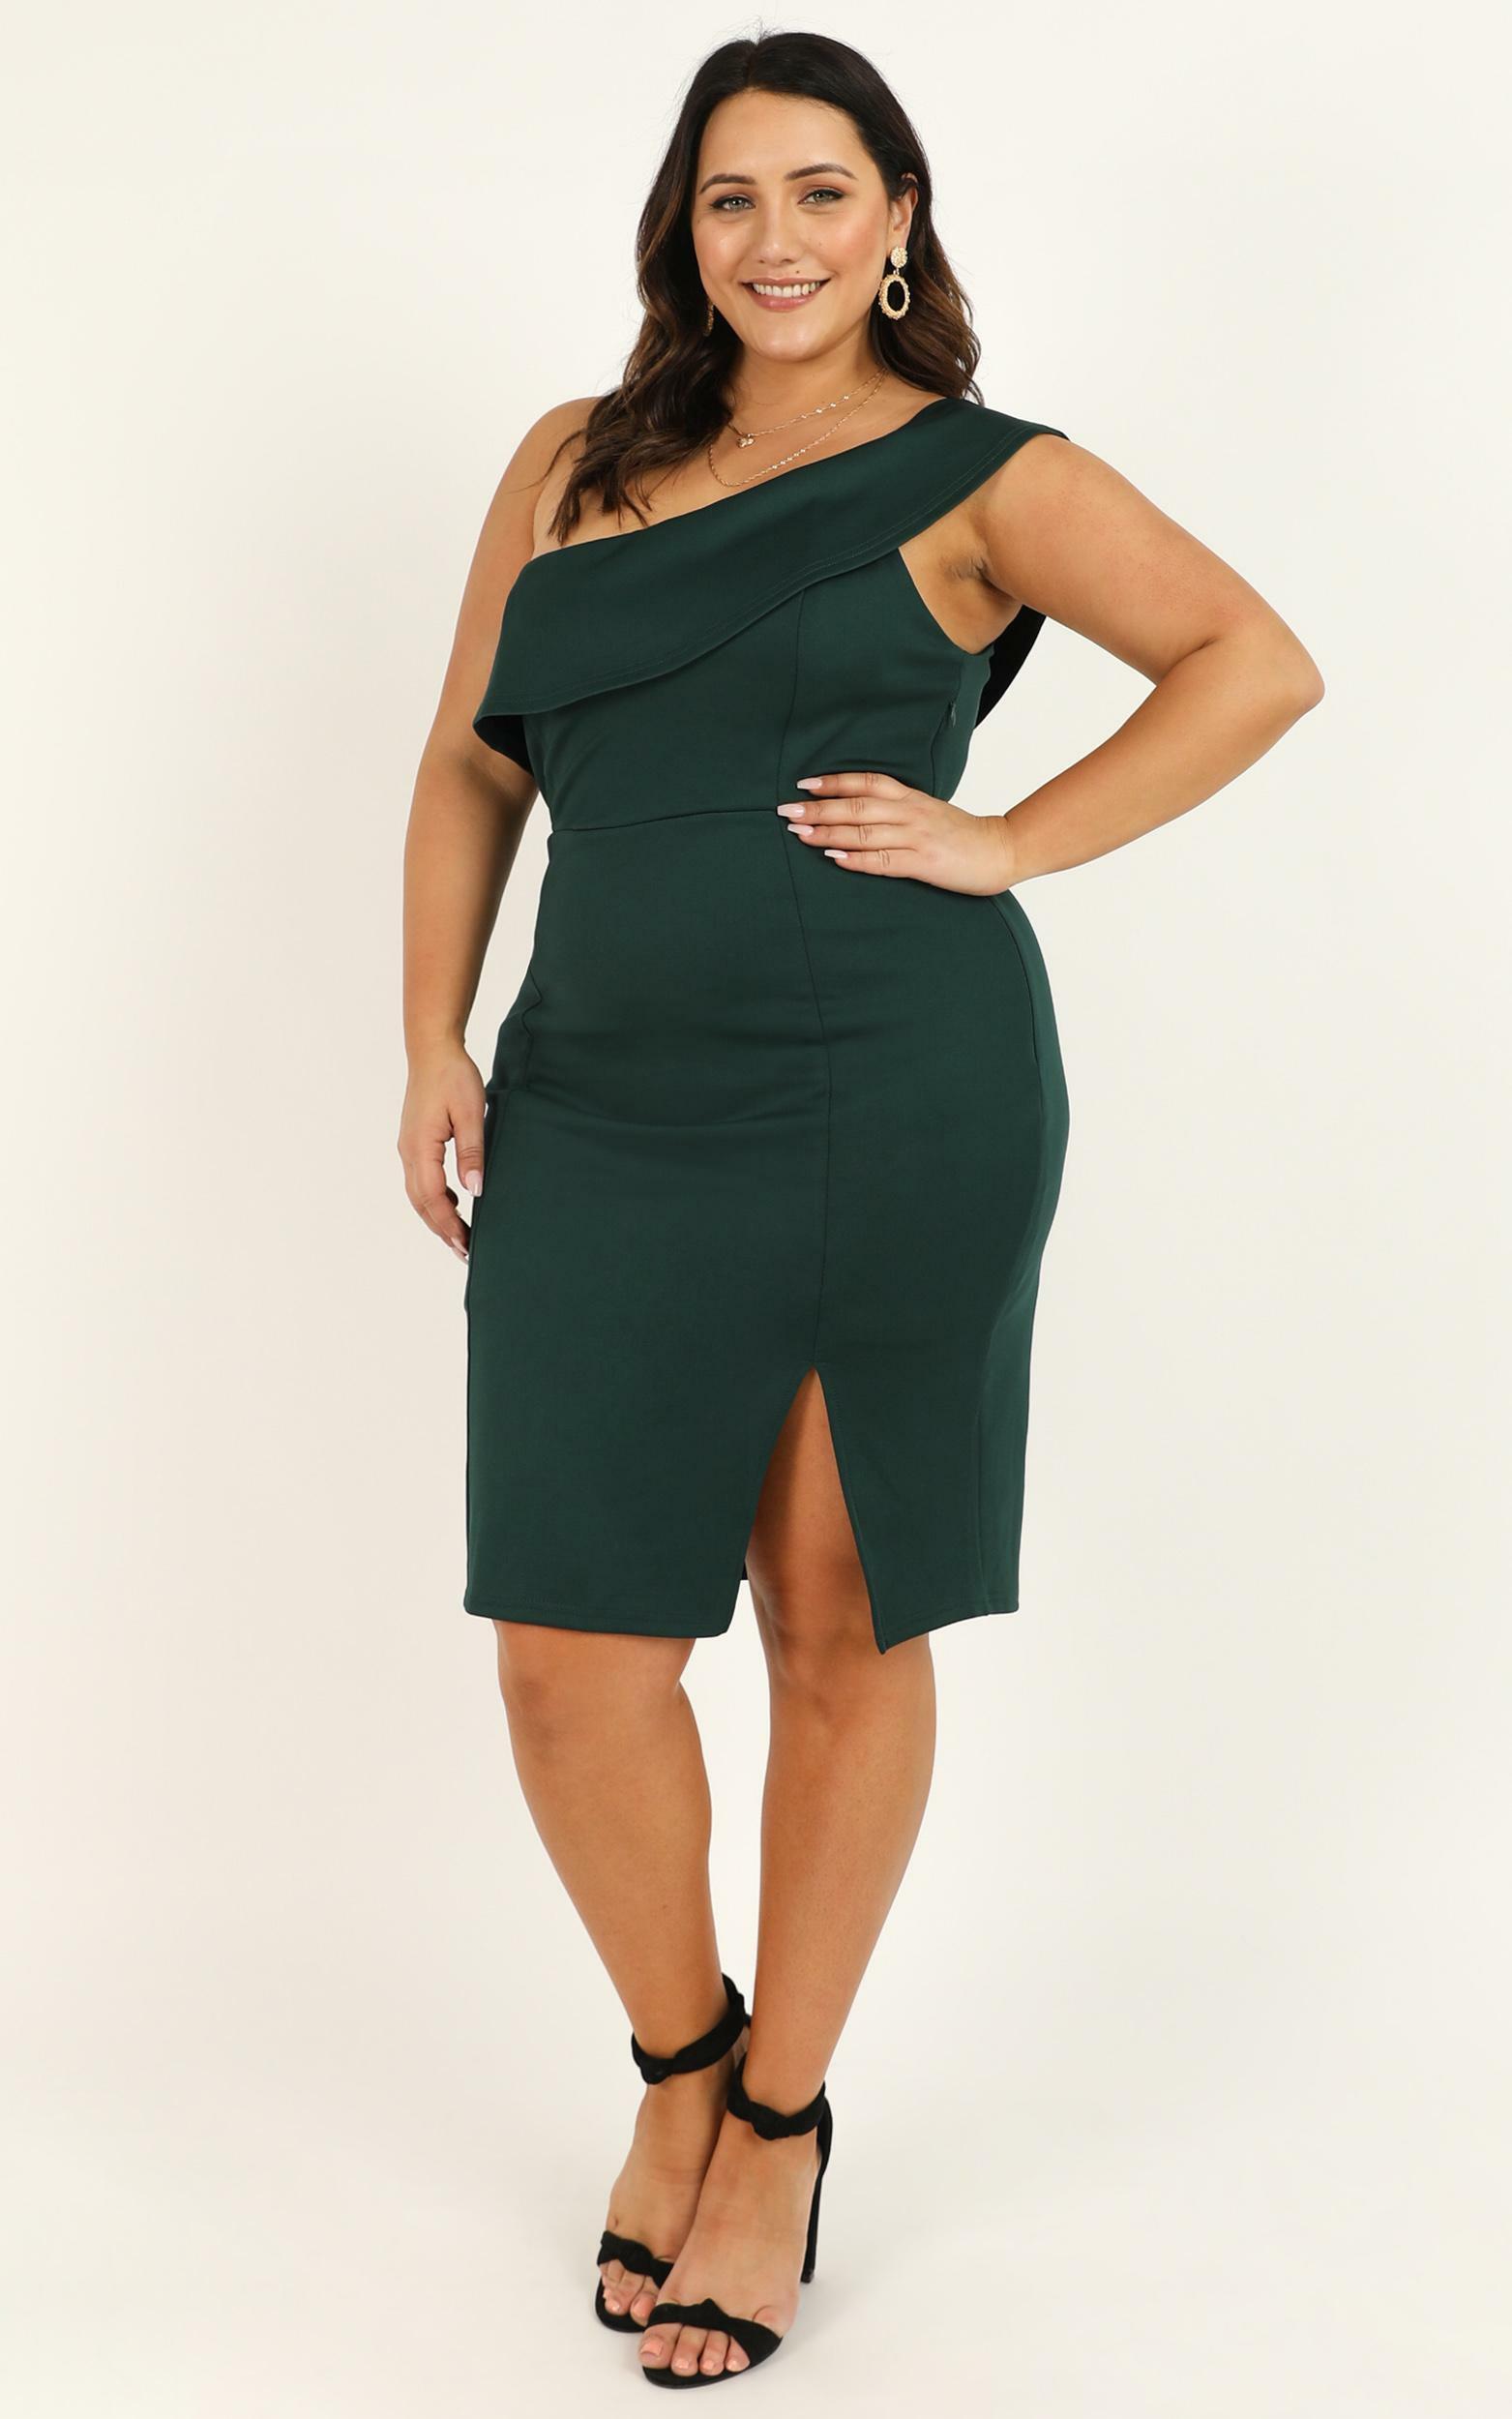 Seven Seas Dress in emerald - 20 (XXXXL), Green, hi-res image number null